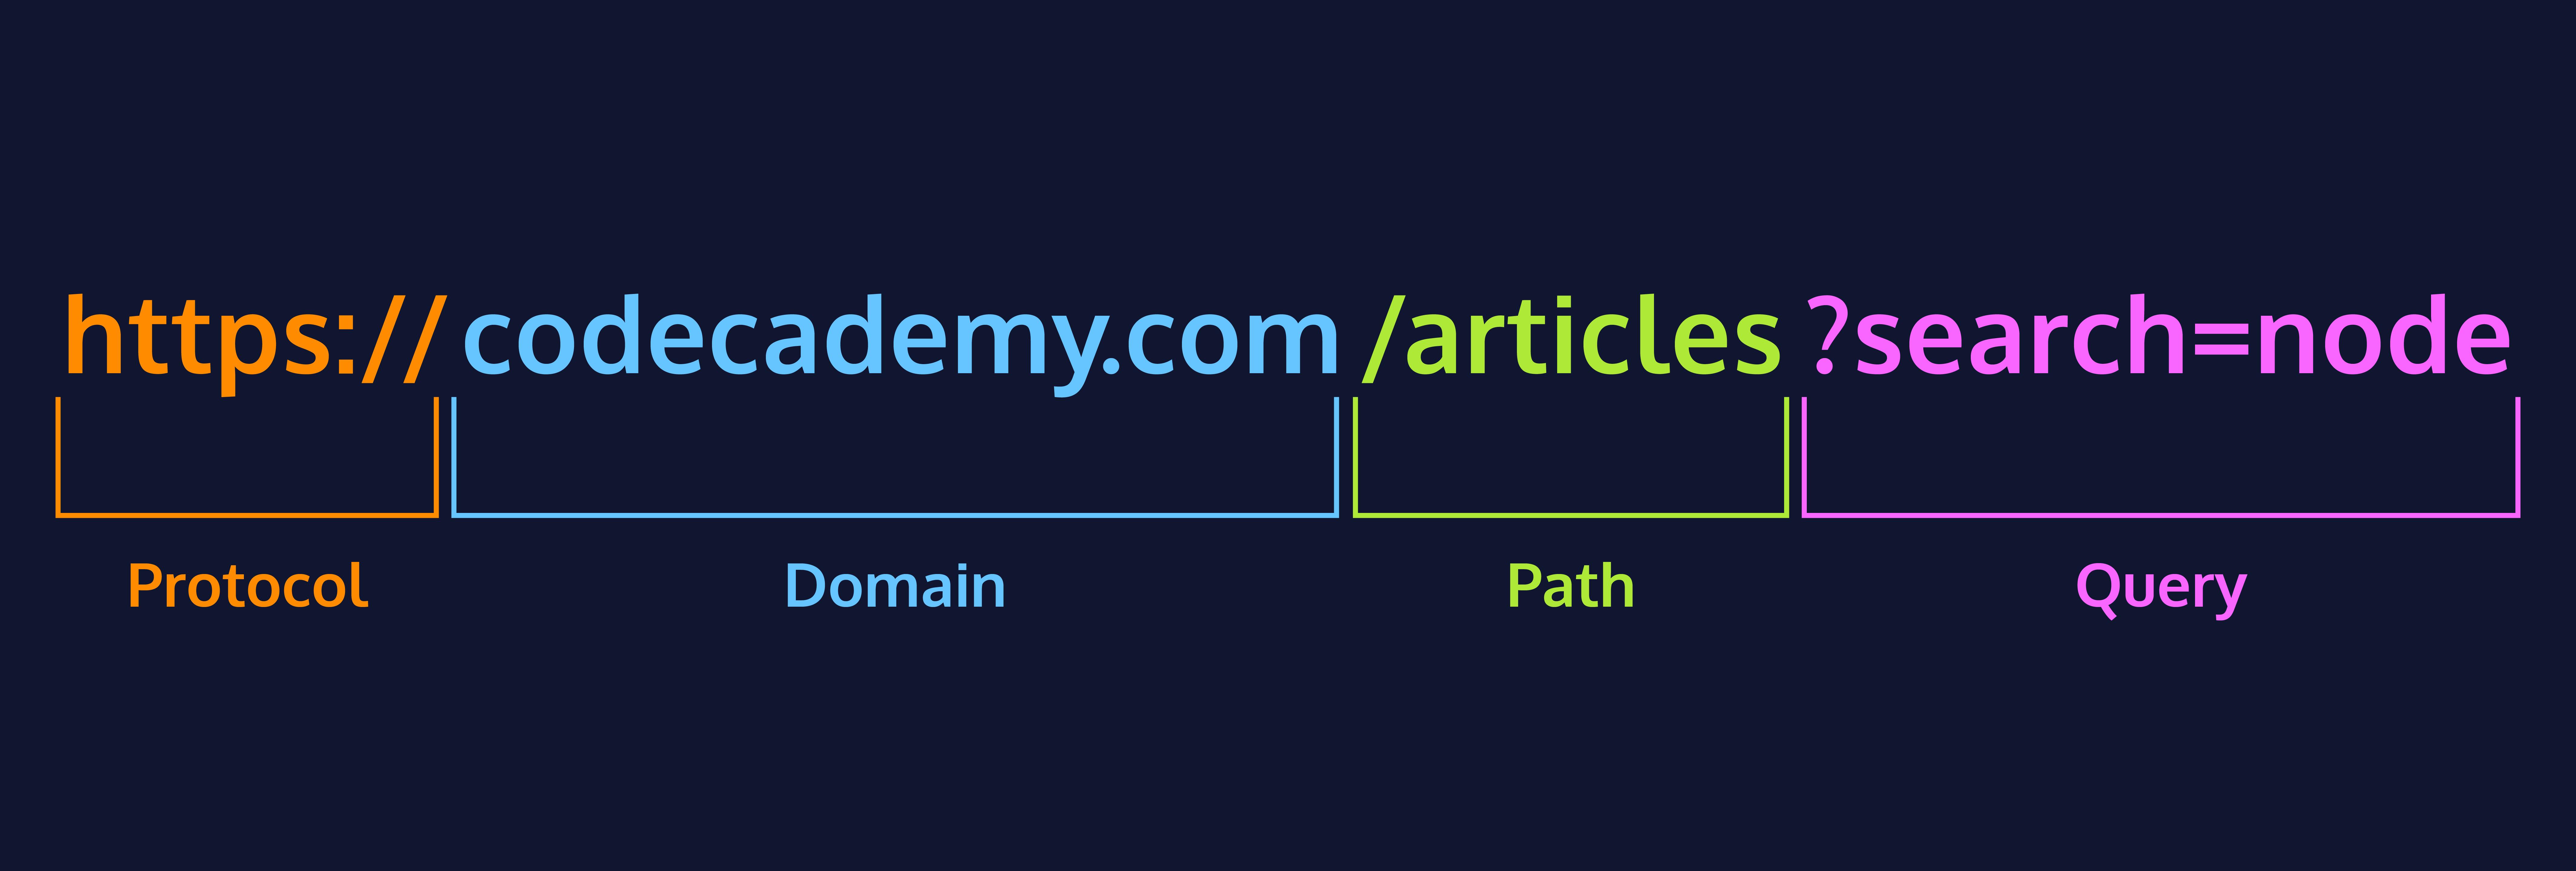 Anatomy of a URL